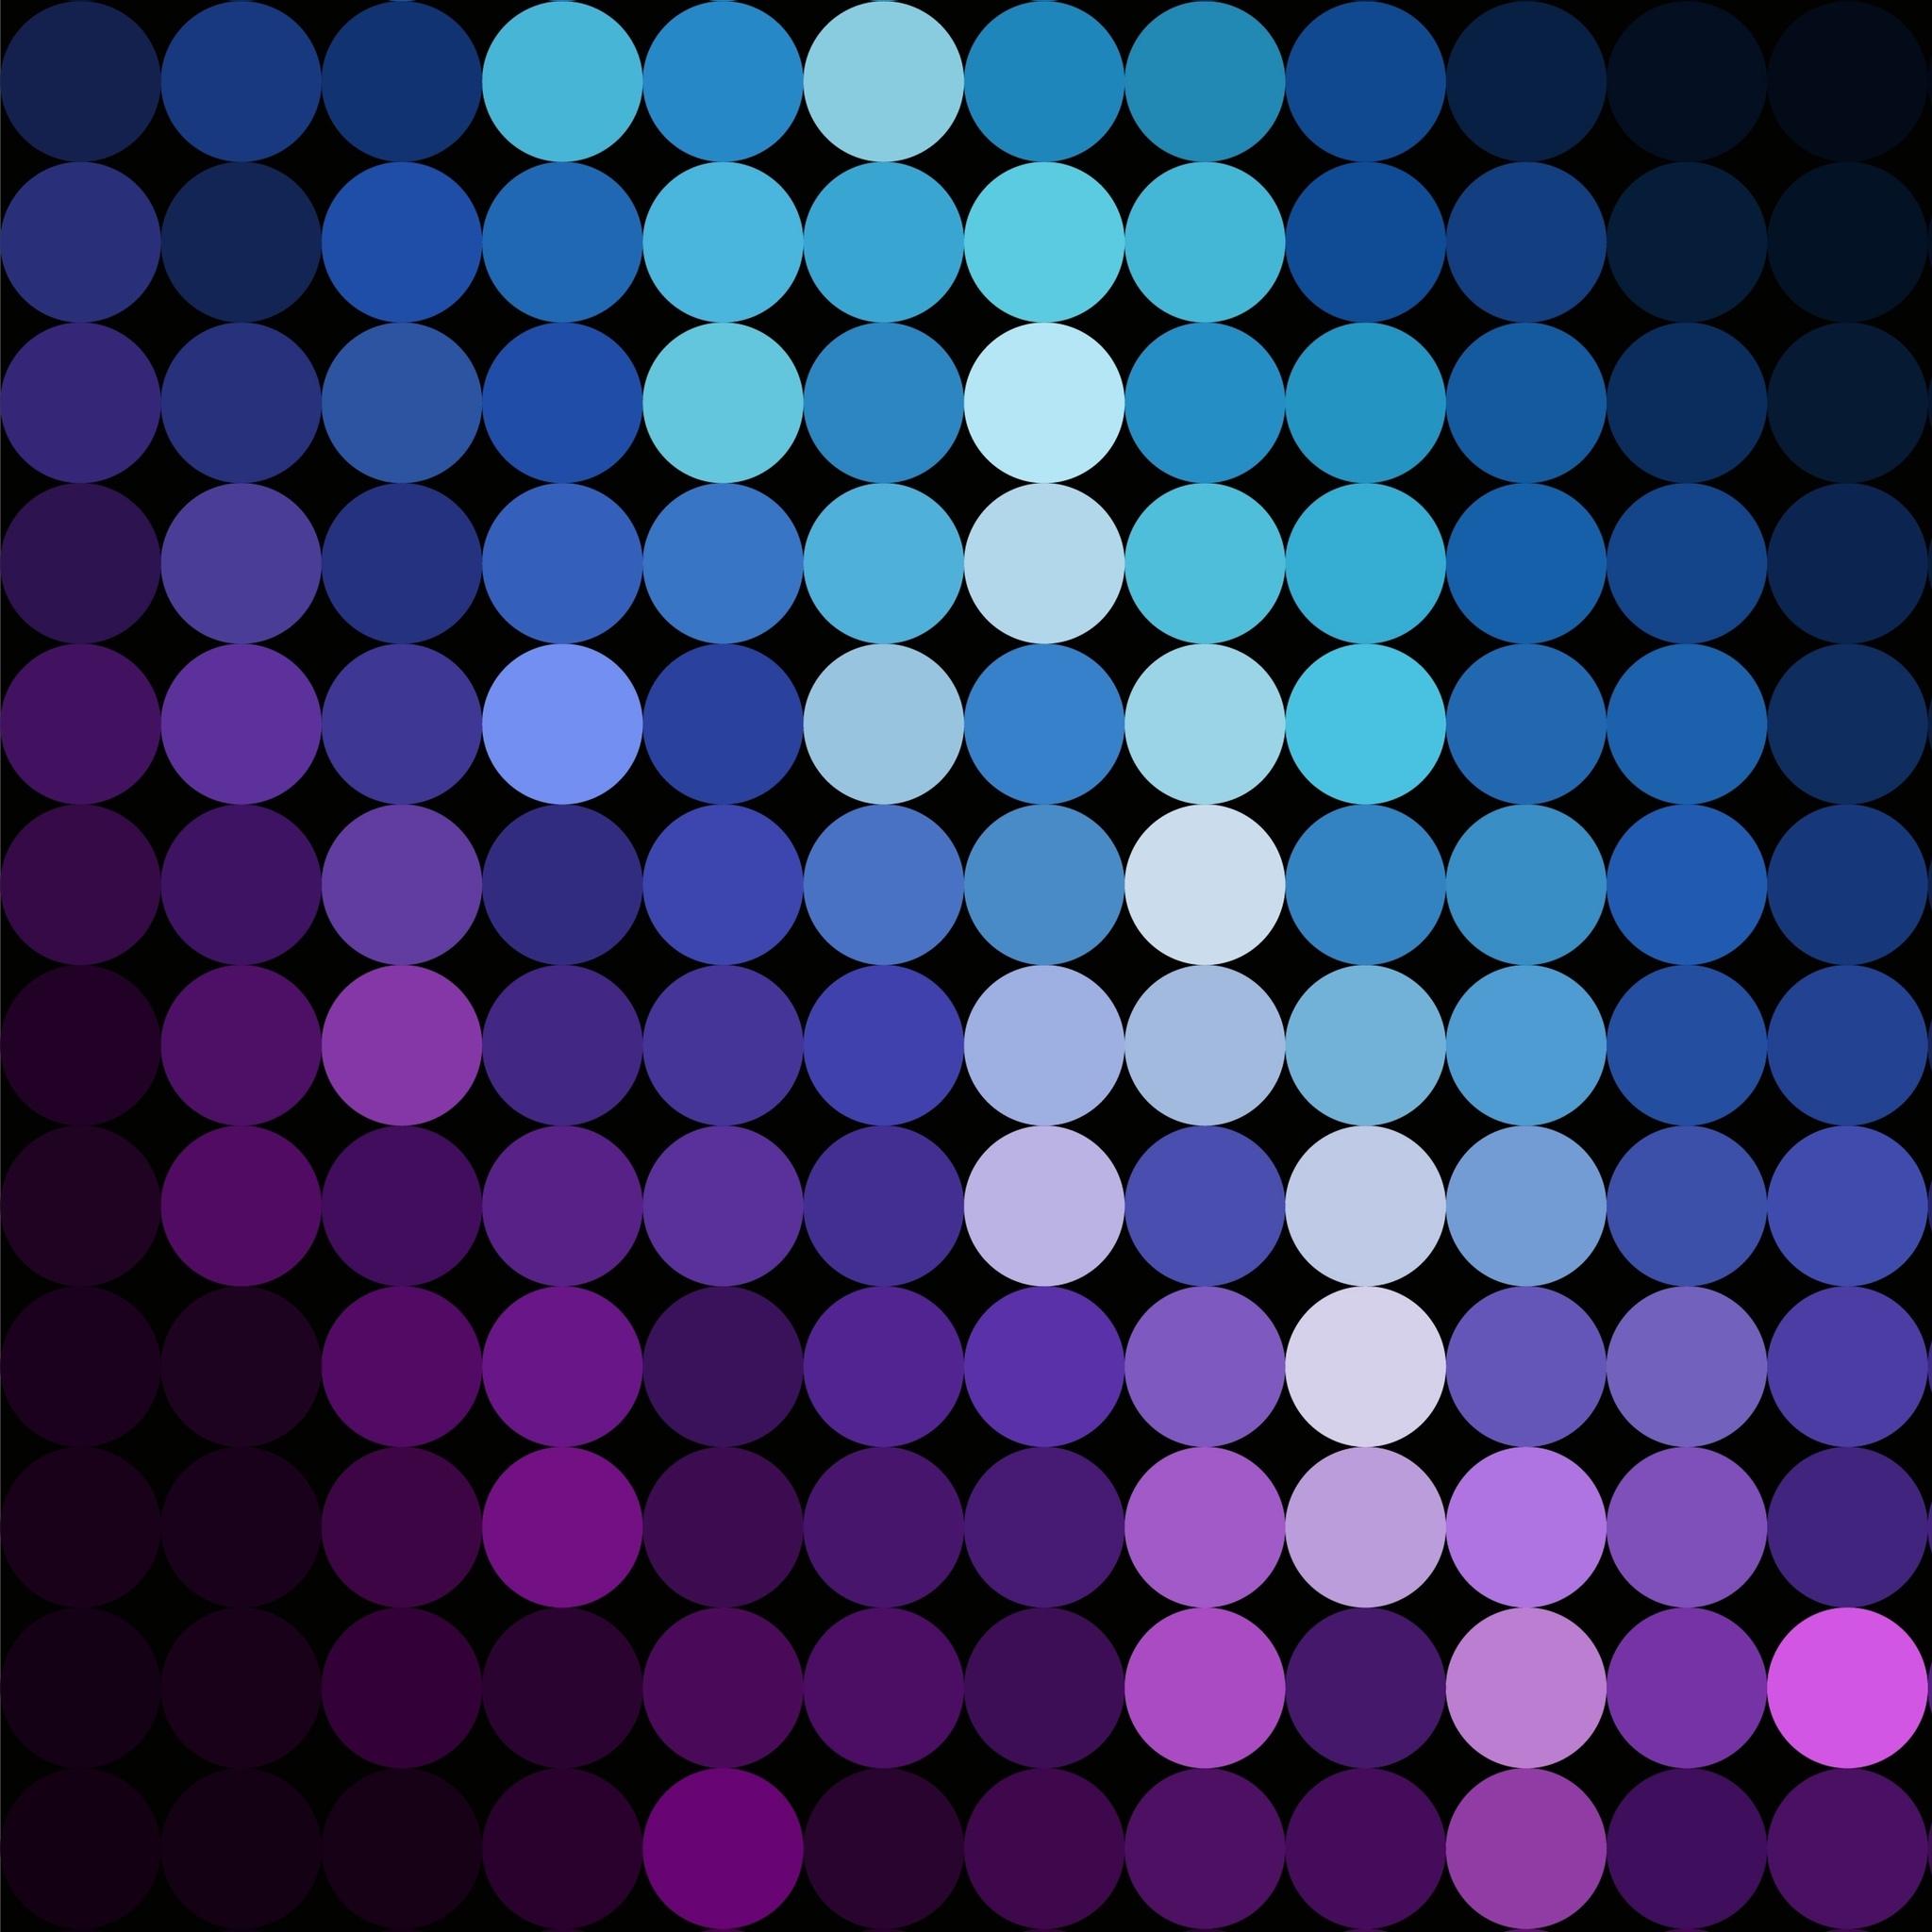 Wallpapers apple ipad retina pack 046 - Retina display wallpapers ipad 2 ...